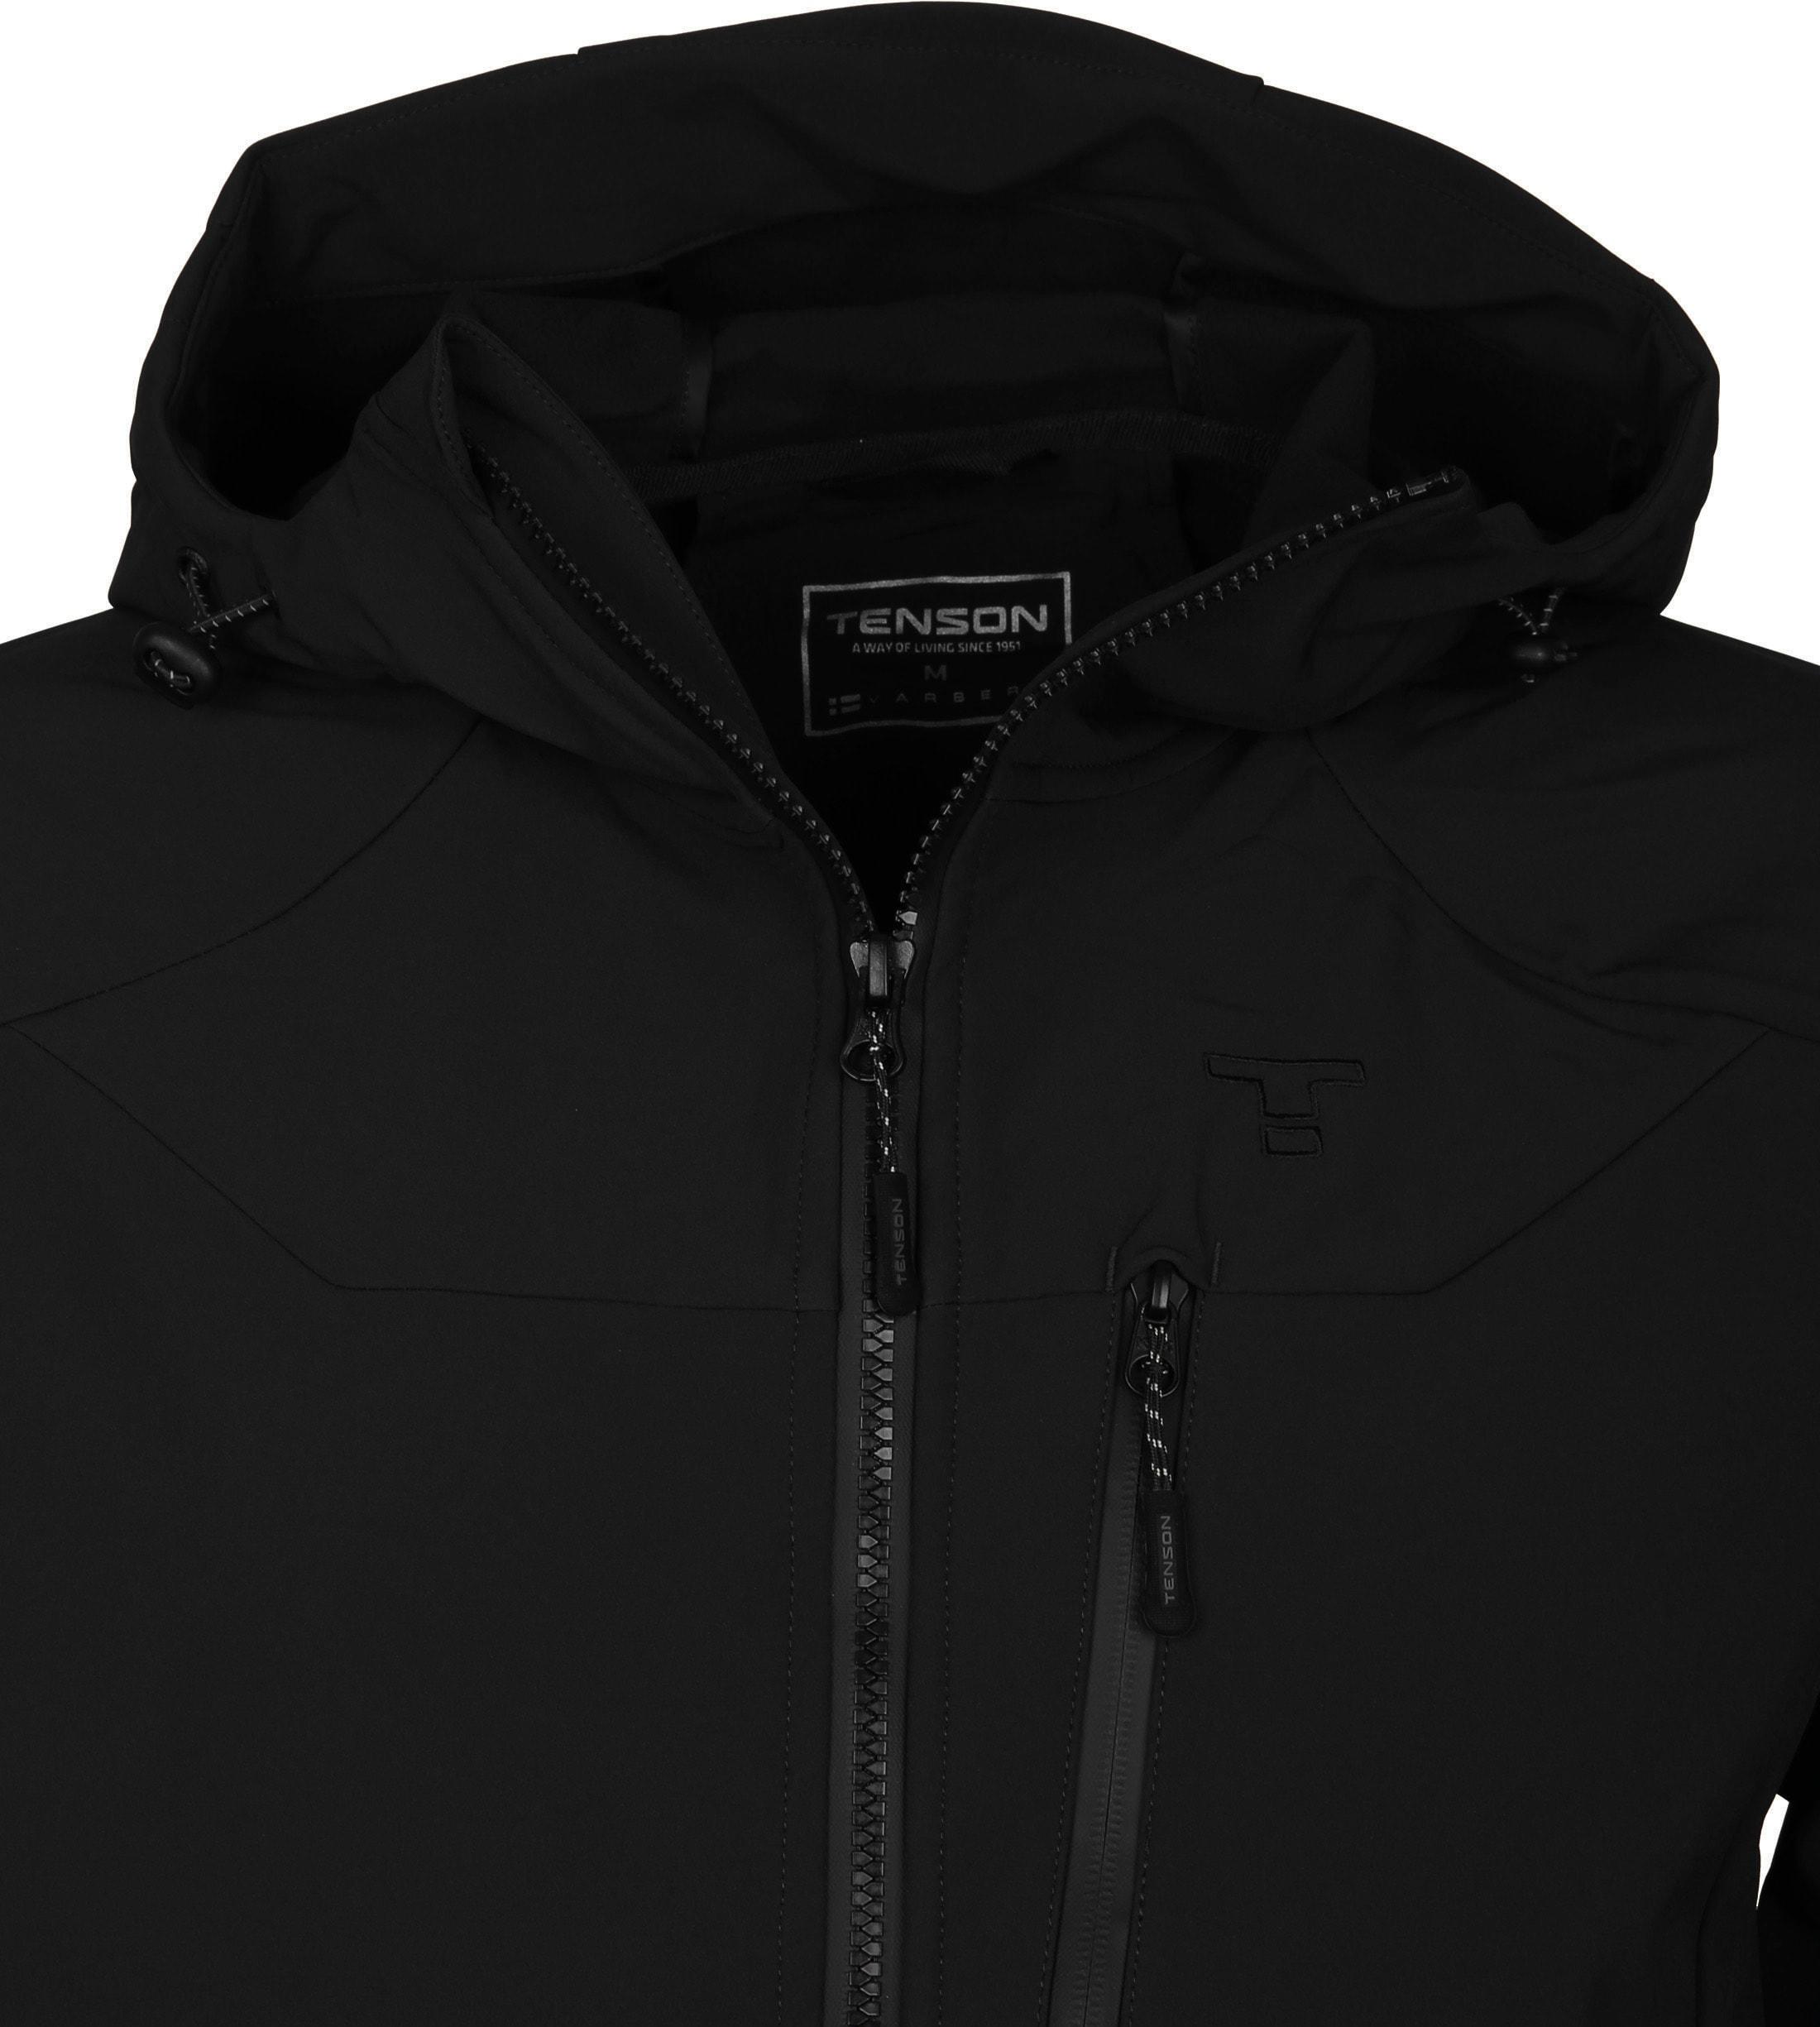 Tenson Taurid Jacket Black foto 1